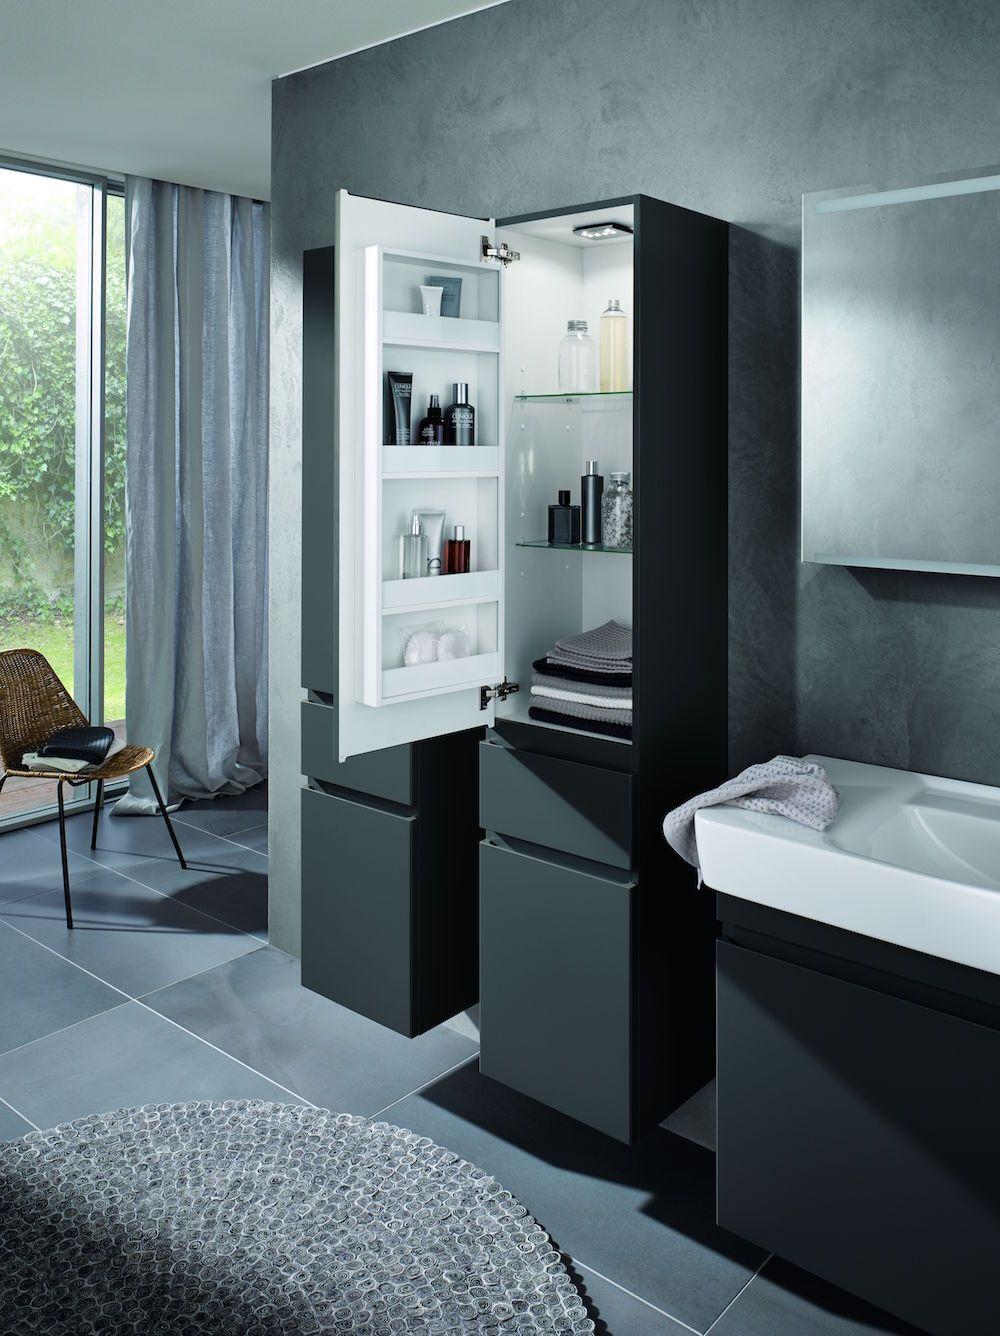 Hoge kast met veel opbergruimte Sphinx 320 badkamermeubel #badkamer ...